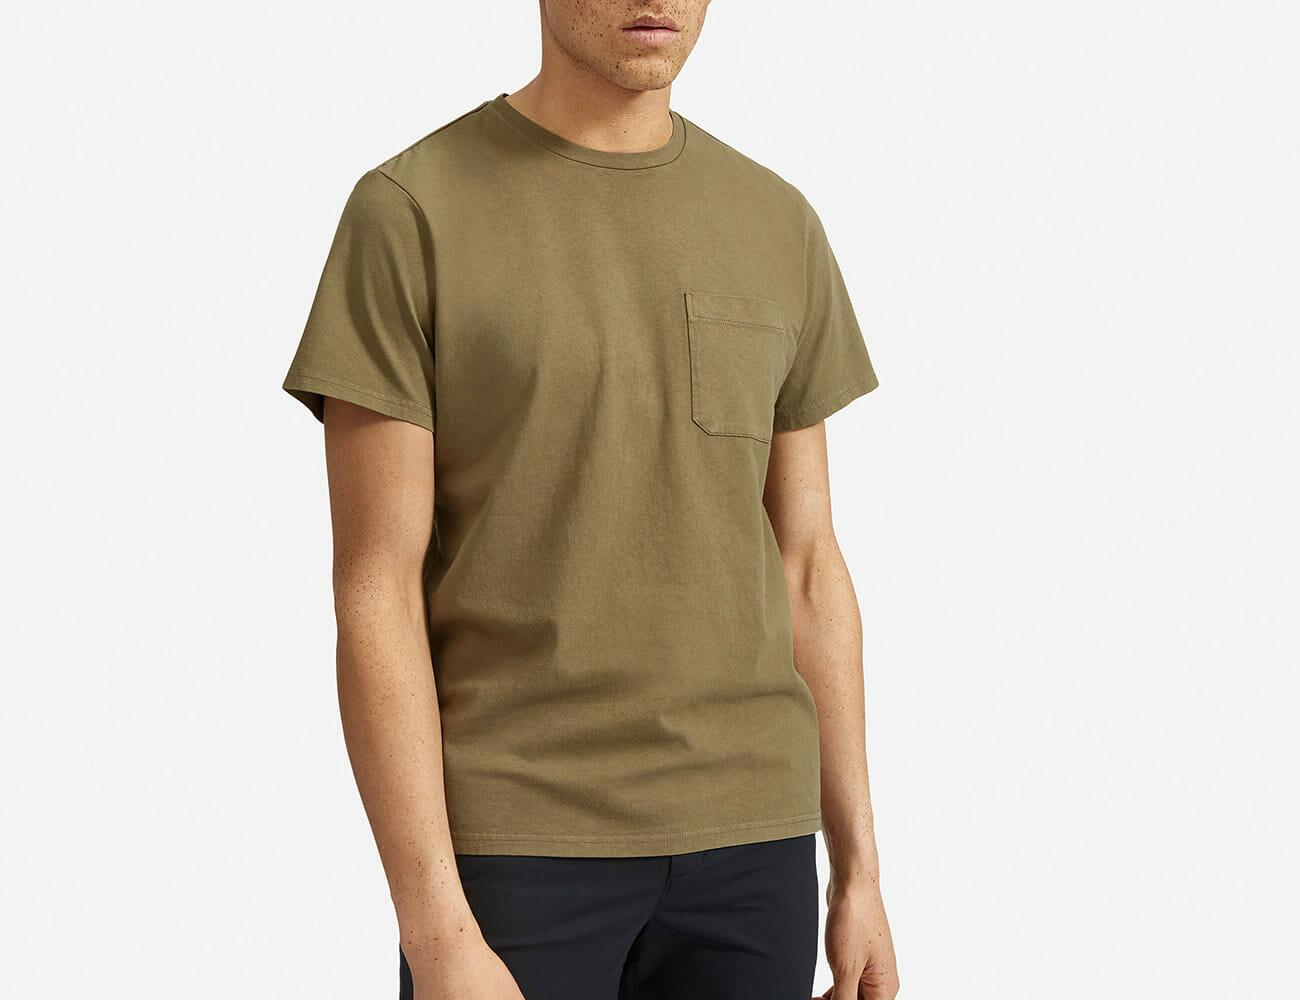 993234aebf532 The 10 Best Basic T-Shirts for Men • Gear Patrol